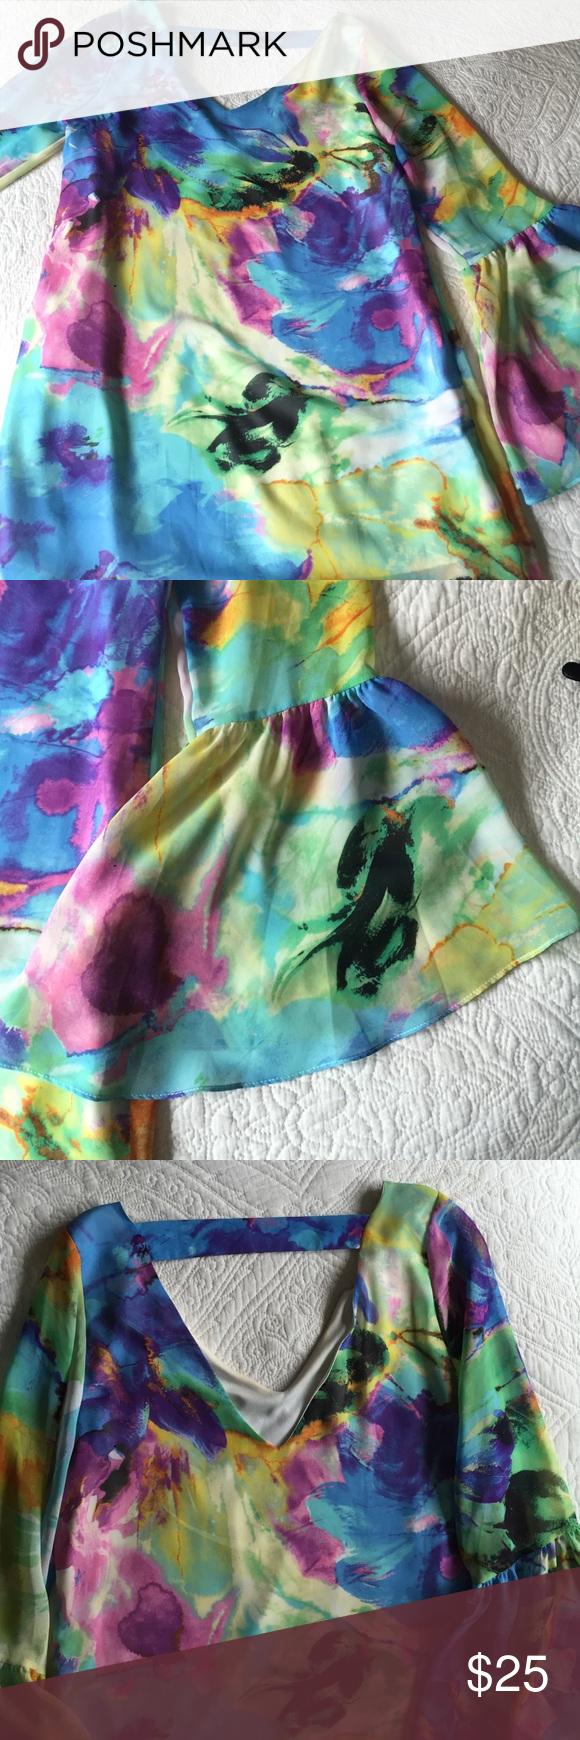 Buddy love multi colored bell sleeve dress V back. Bell sleeves. Worn like 3 times max. Buddy love Dresses Mini